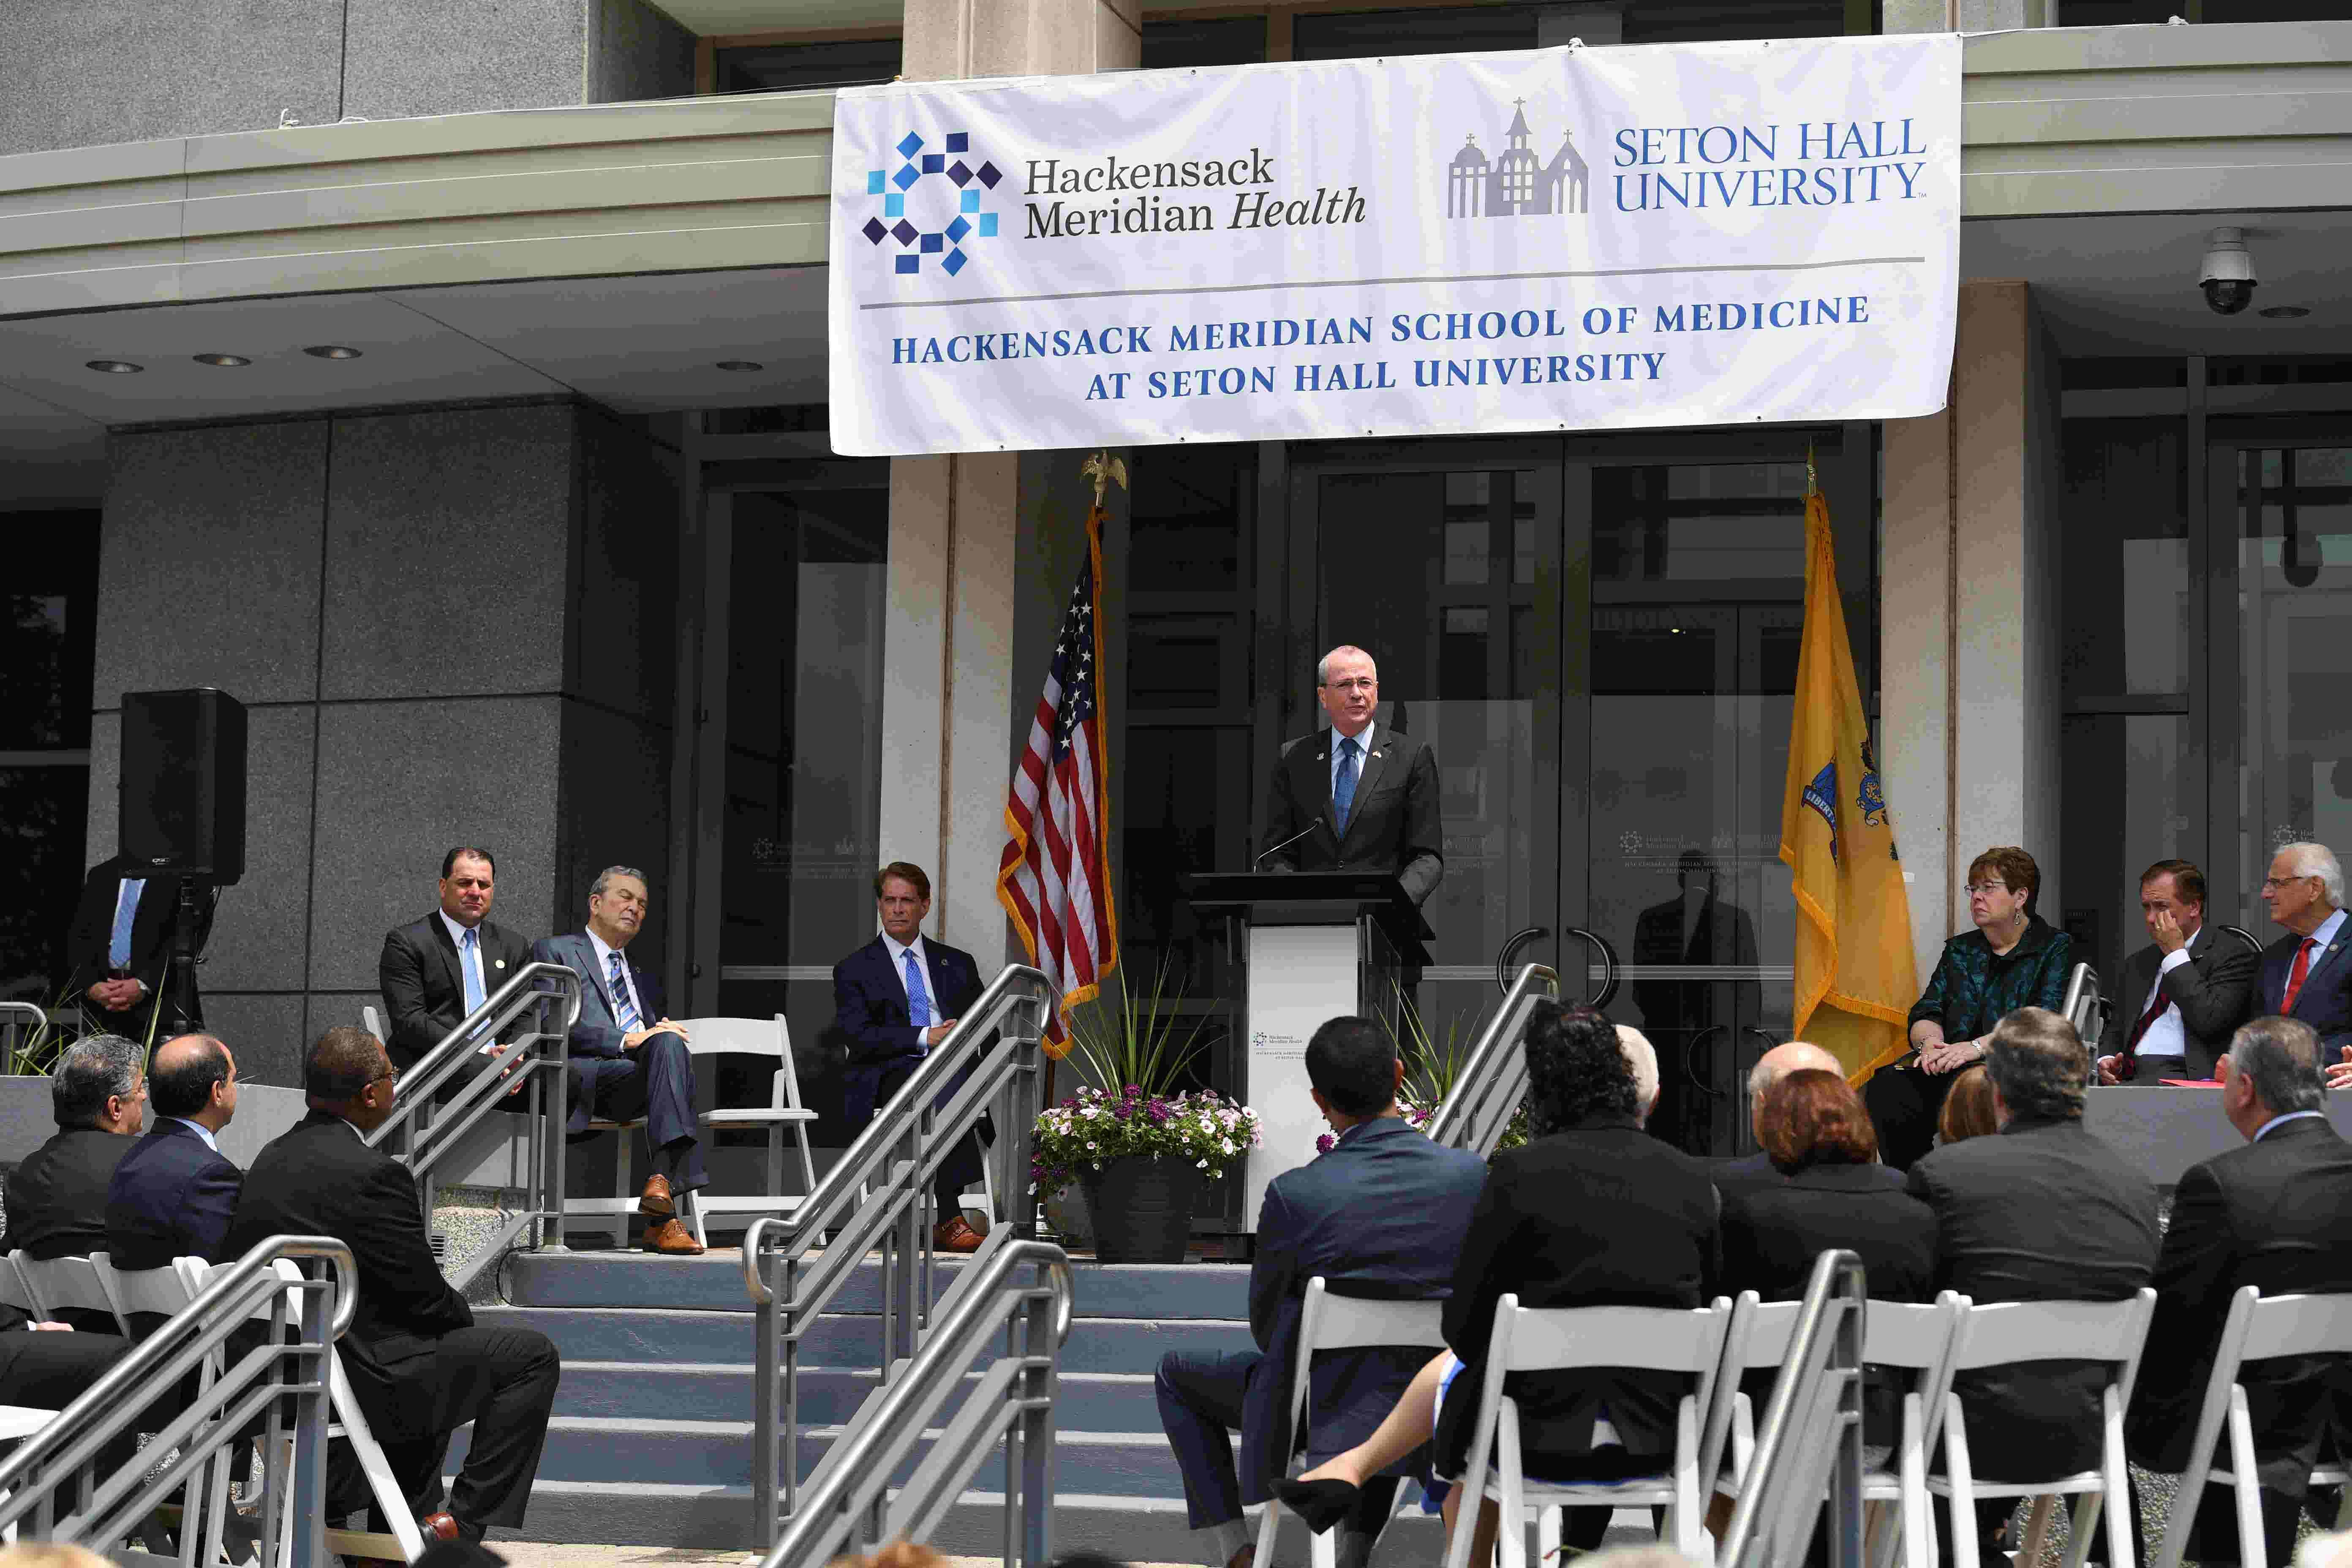 Hackensack Meridian Health Seton Hall Medical School Officially Opens